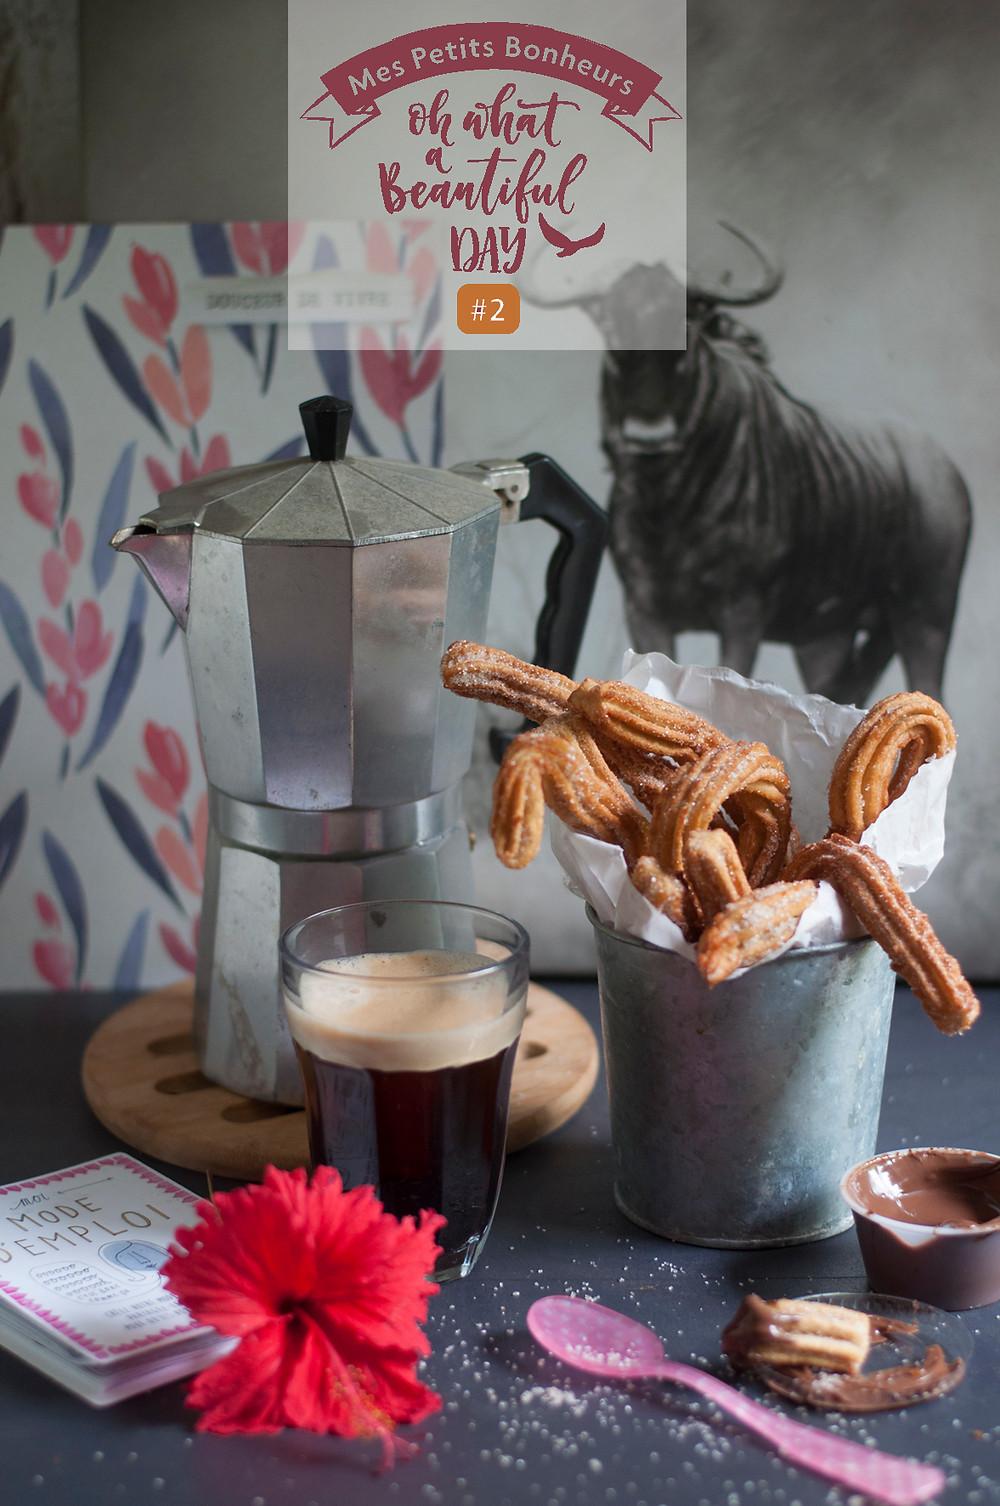 Mes Petits Lundis Bonheur #2 chichis au chocolat